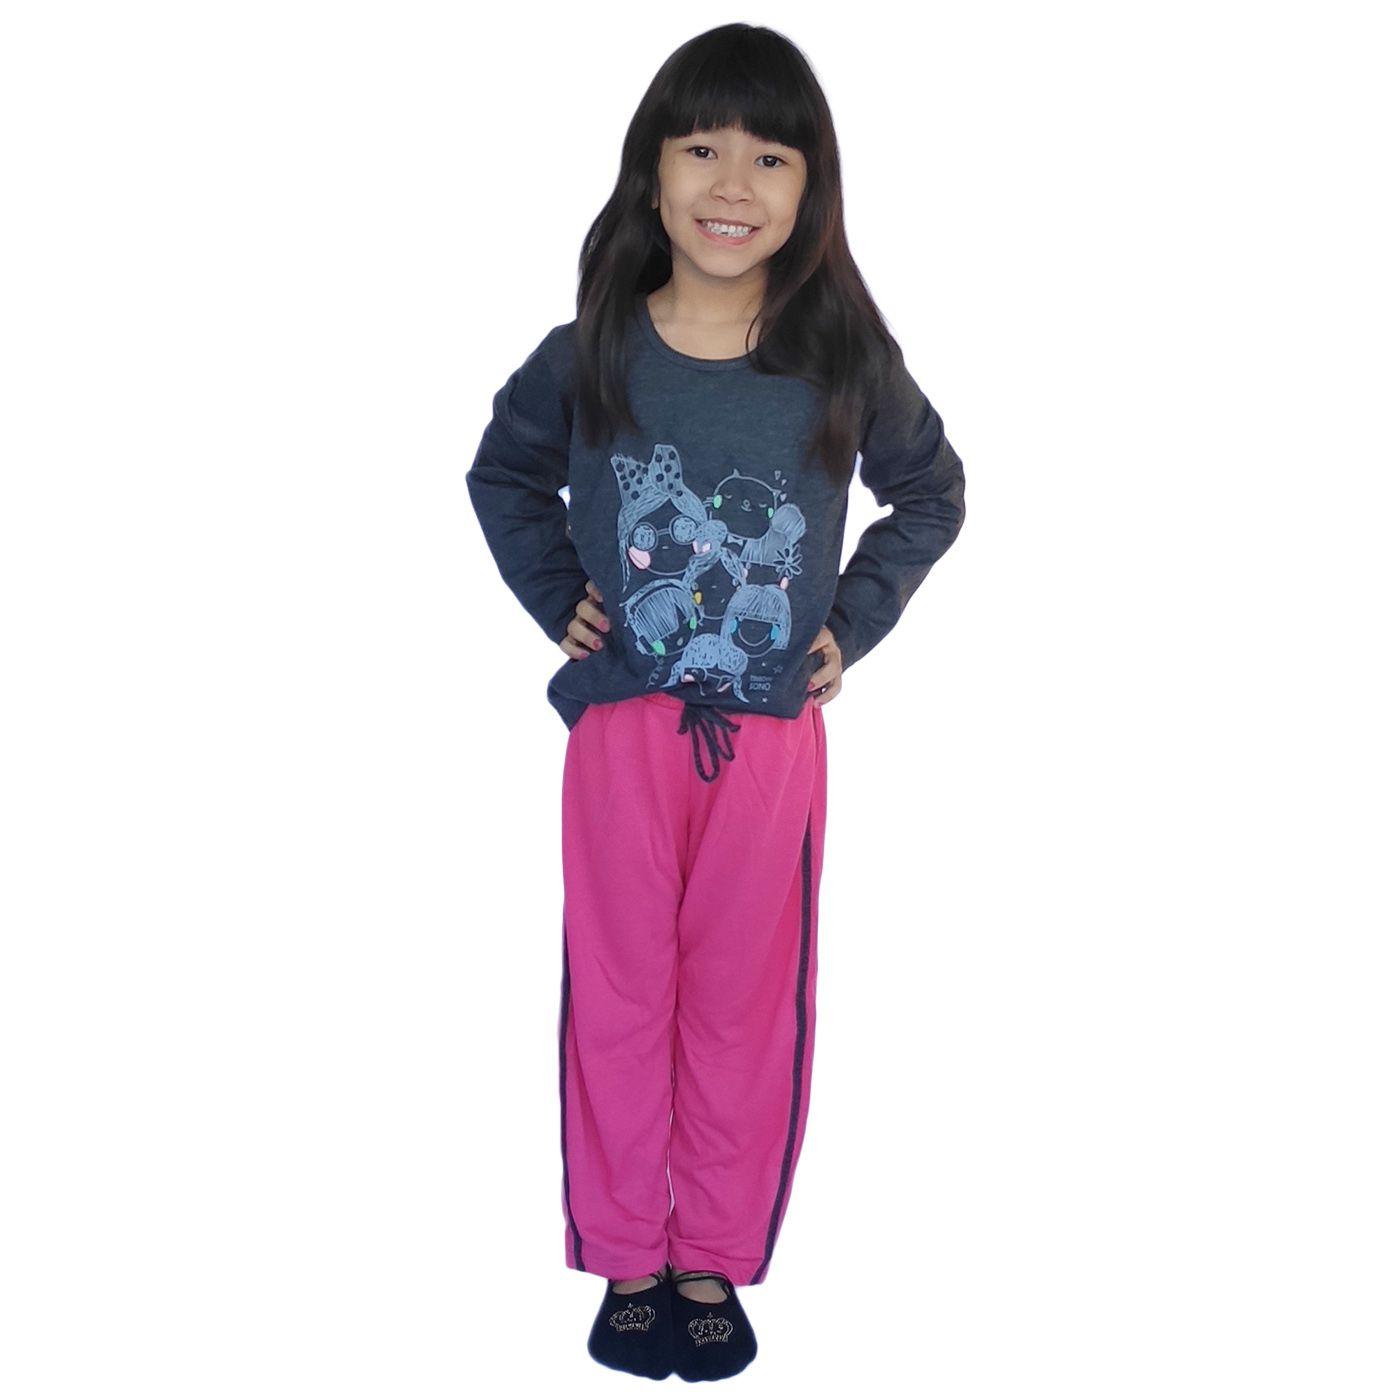 Pijama infantil menina frio manga longa